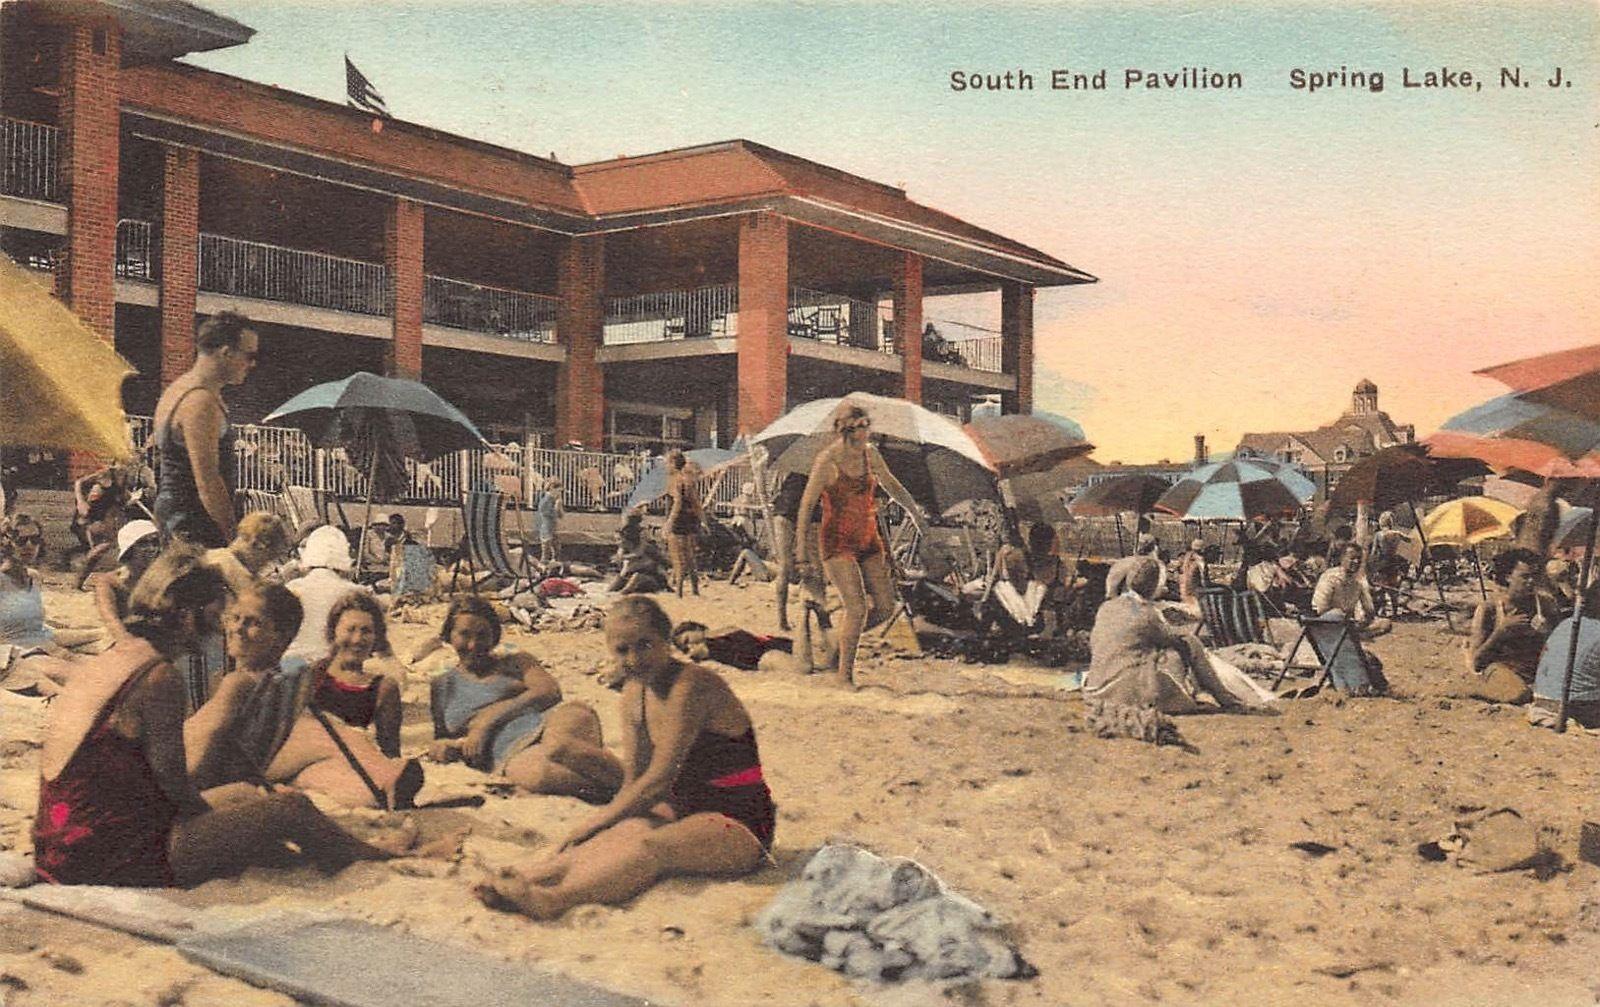 f0bed2312a946719494047906adfa57a - Monmouth Beach Bathing Pavilion Application